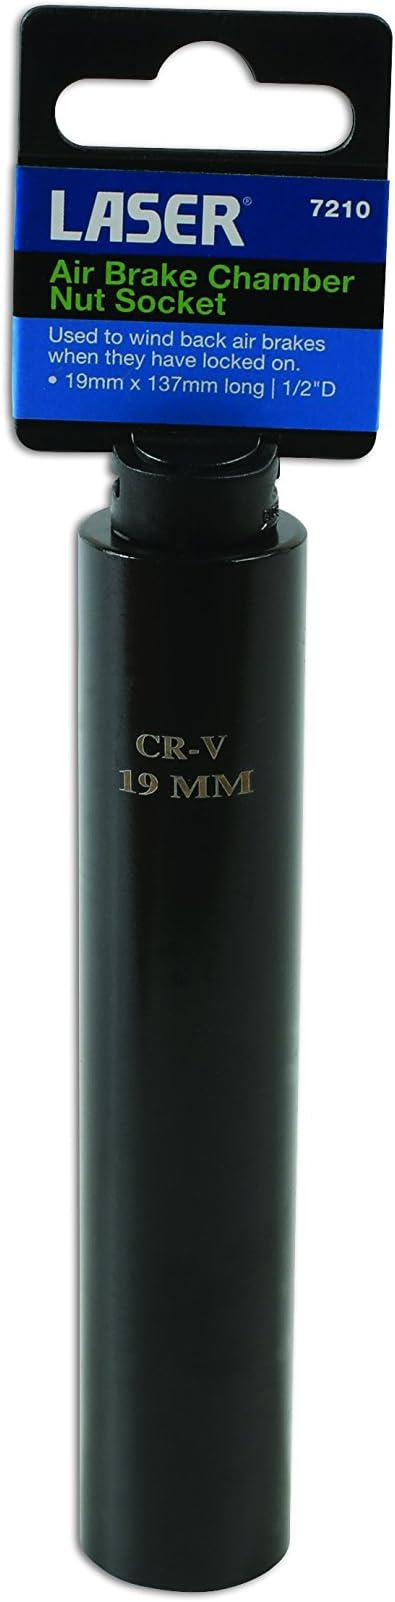 "Air Brake Chamber Nut Socket 19Mm 1//2/""D Laser 7210"